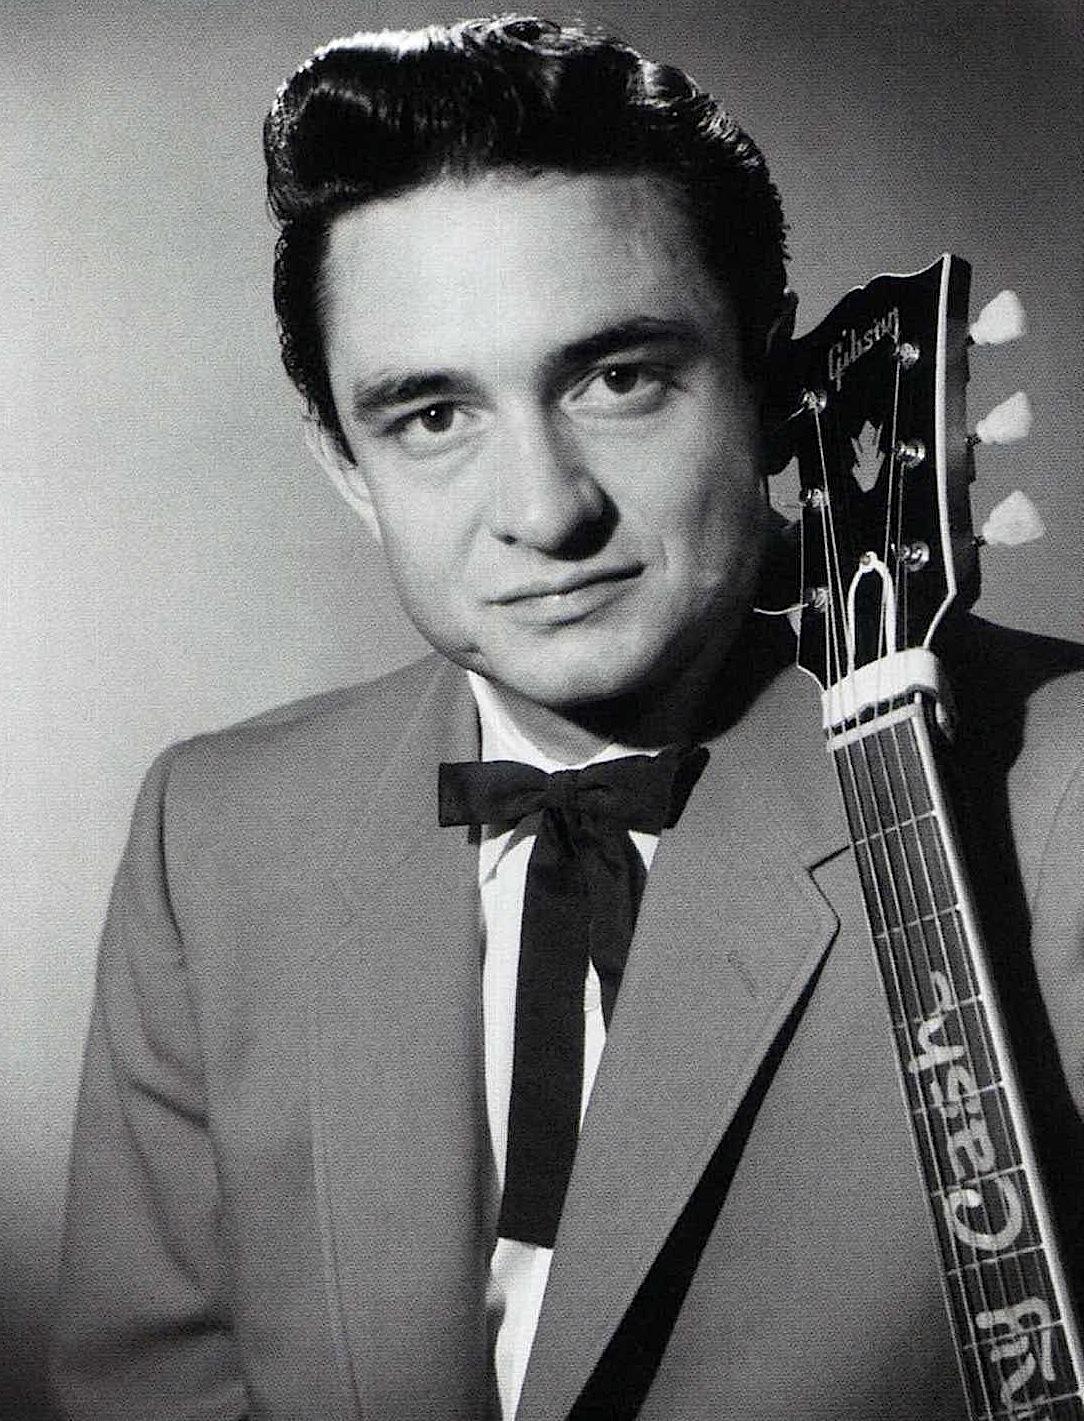 Dec 15: Johnny Cash released the single Folsom Prison Blues in 1955 | Born To Listen